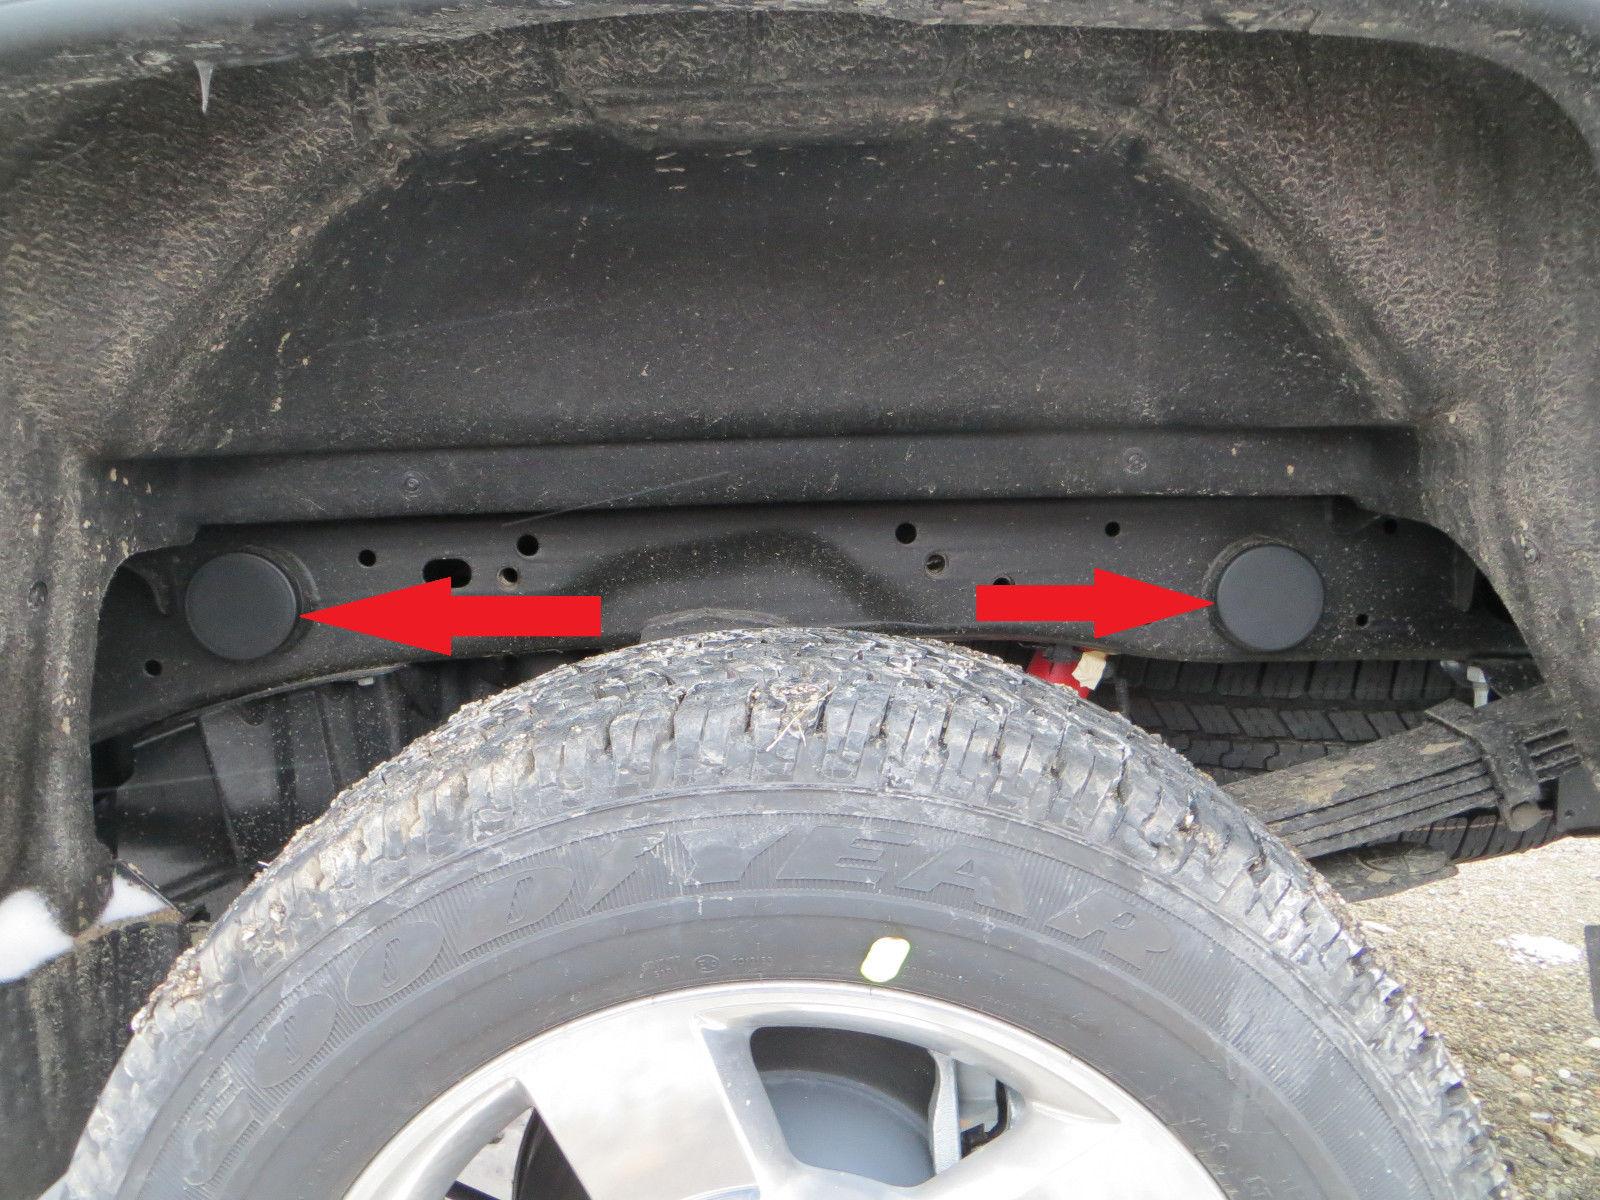 set of 4 frame plugs Sierra GMC 1500 Chevrolet Silverado 1500 99-2018 Accessory